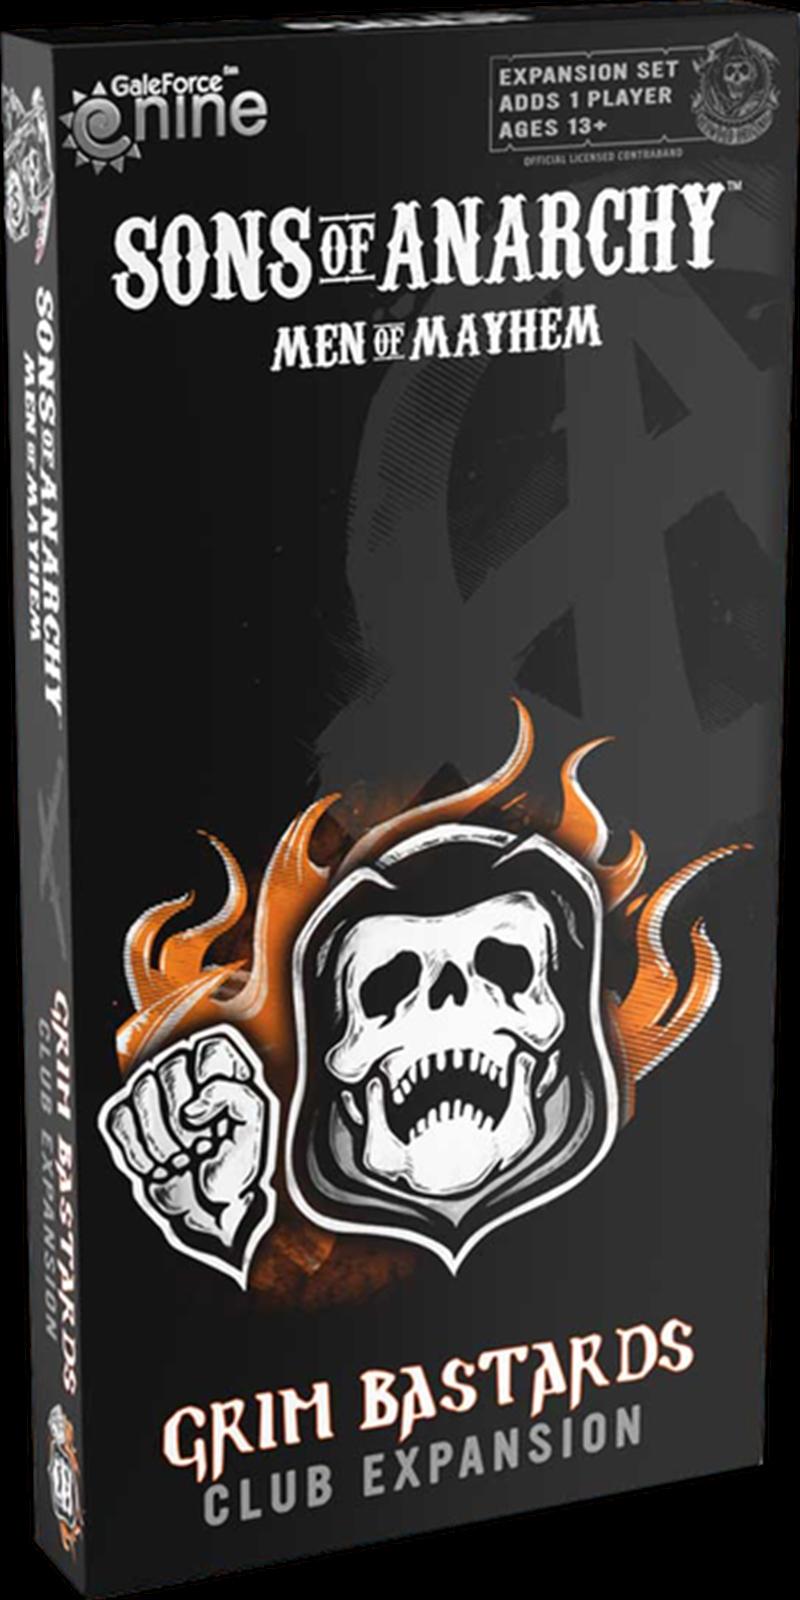 Sons of Anarchy - Grim Bastards Expansion   Merchandise